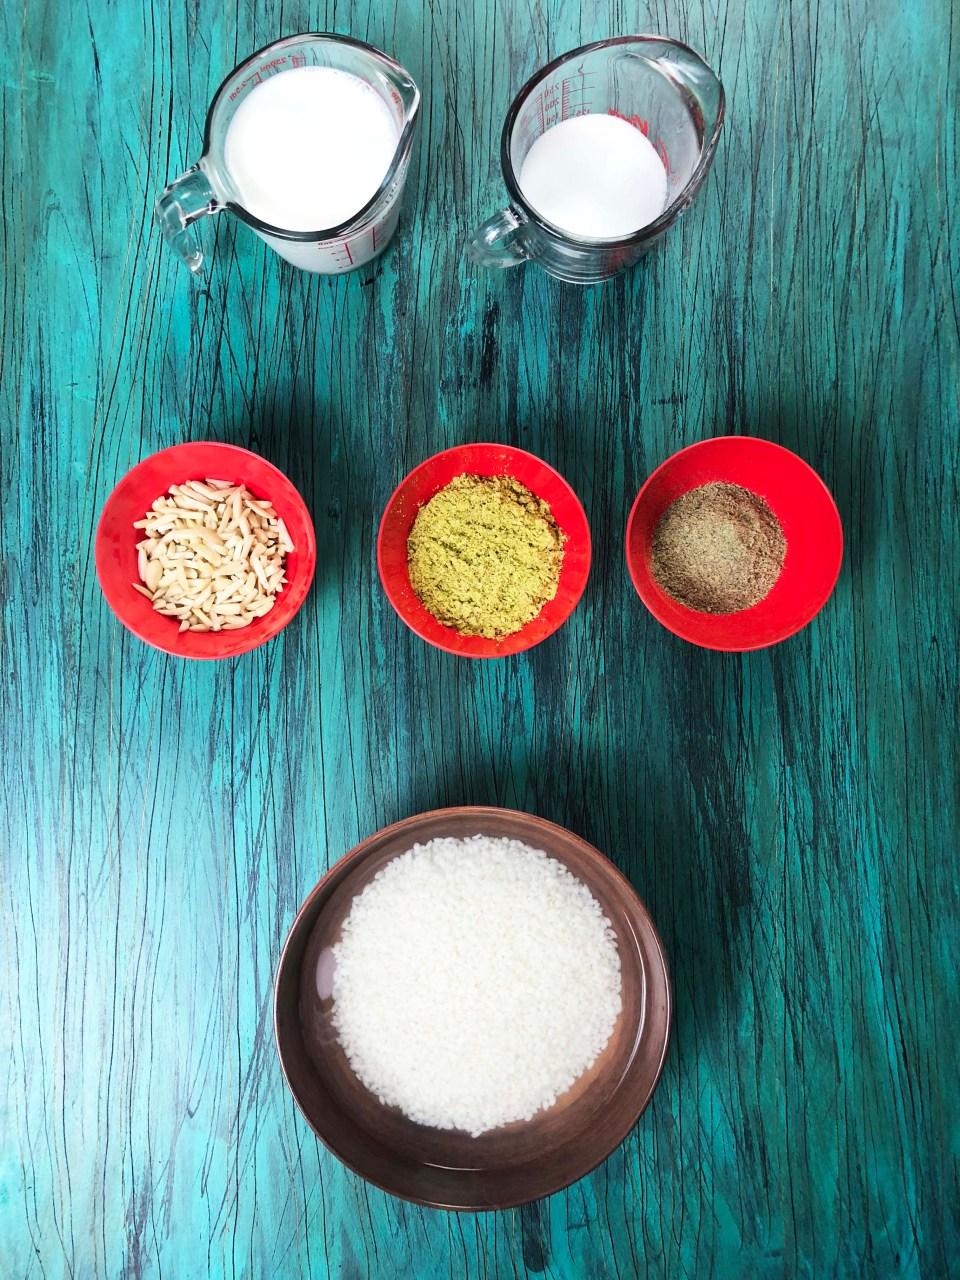 Ingredients needed to make Shir Berenj Recipe (Afghan Rice Pudding)